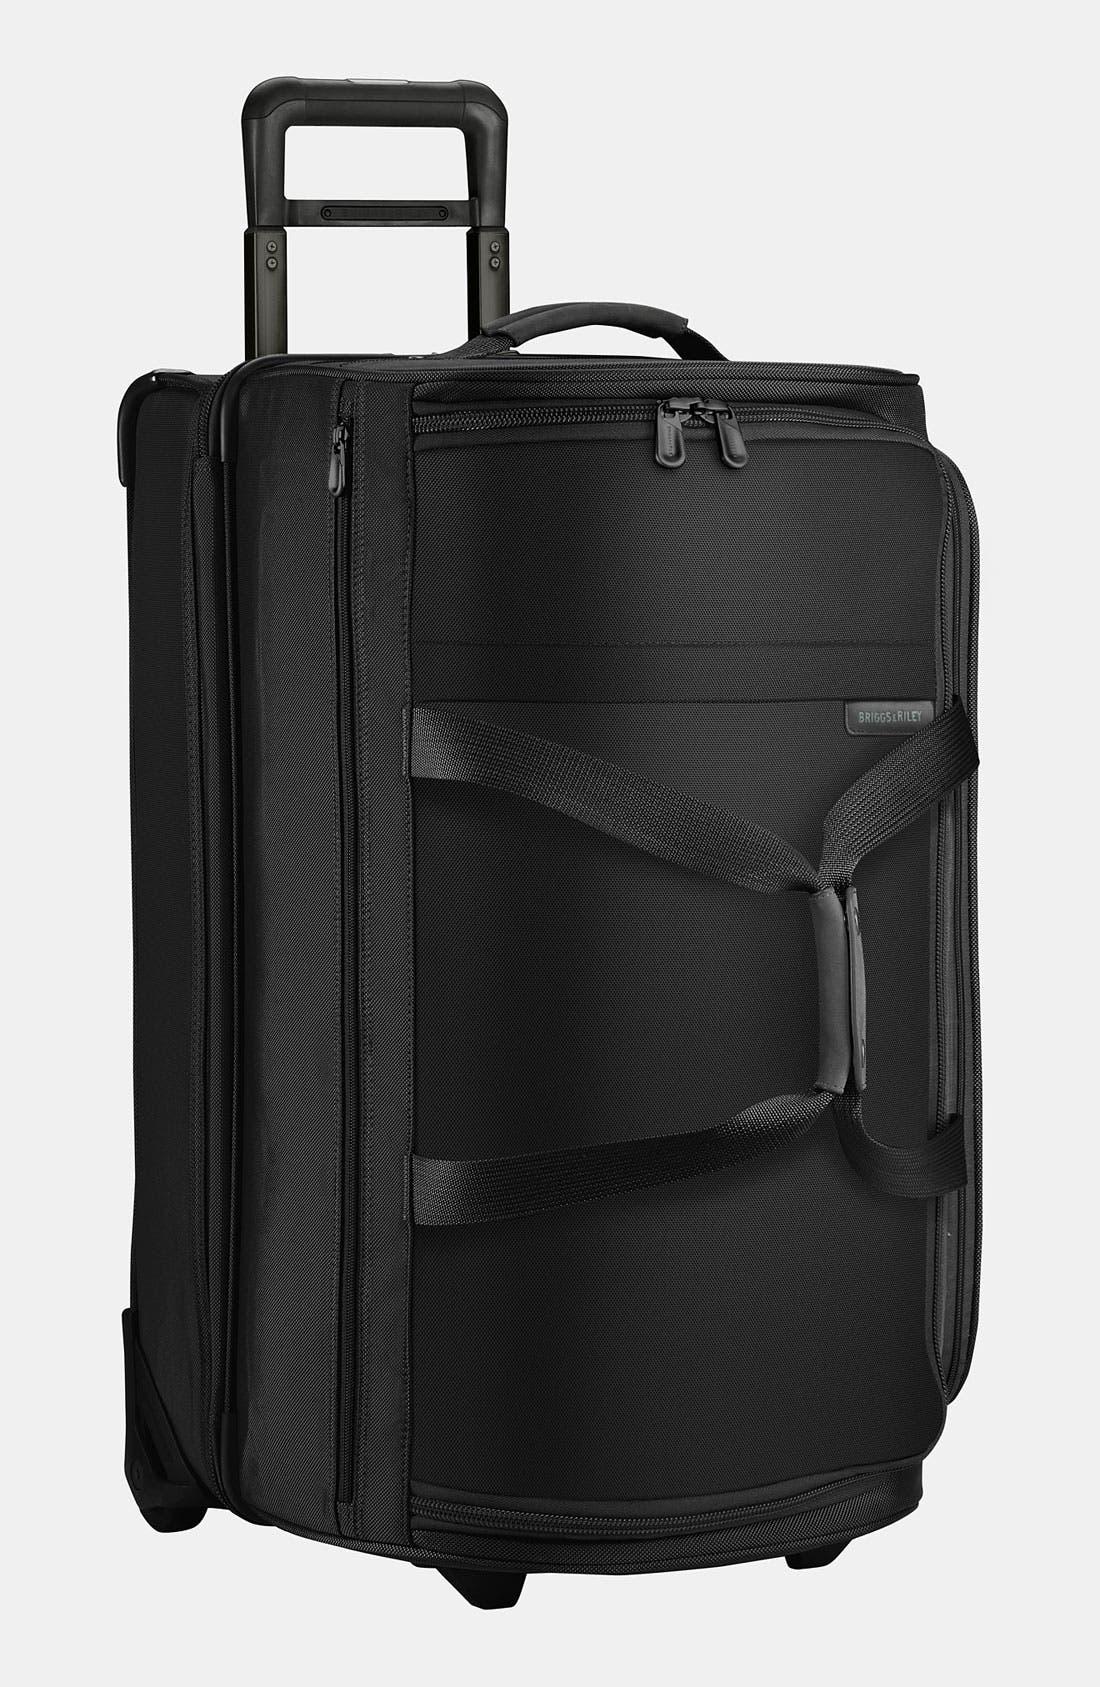 Alternate Image 1 Selected - Briggs & Riley 'Medium Baseline' Rolling Duffel Bag (27 Inch)